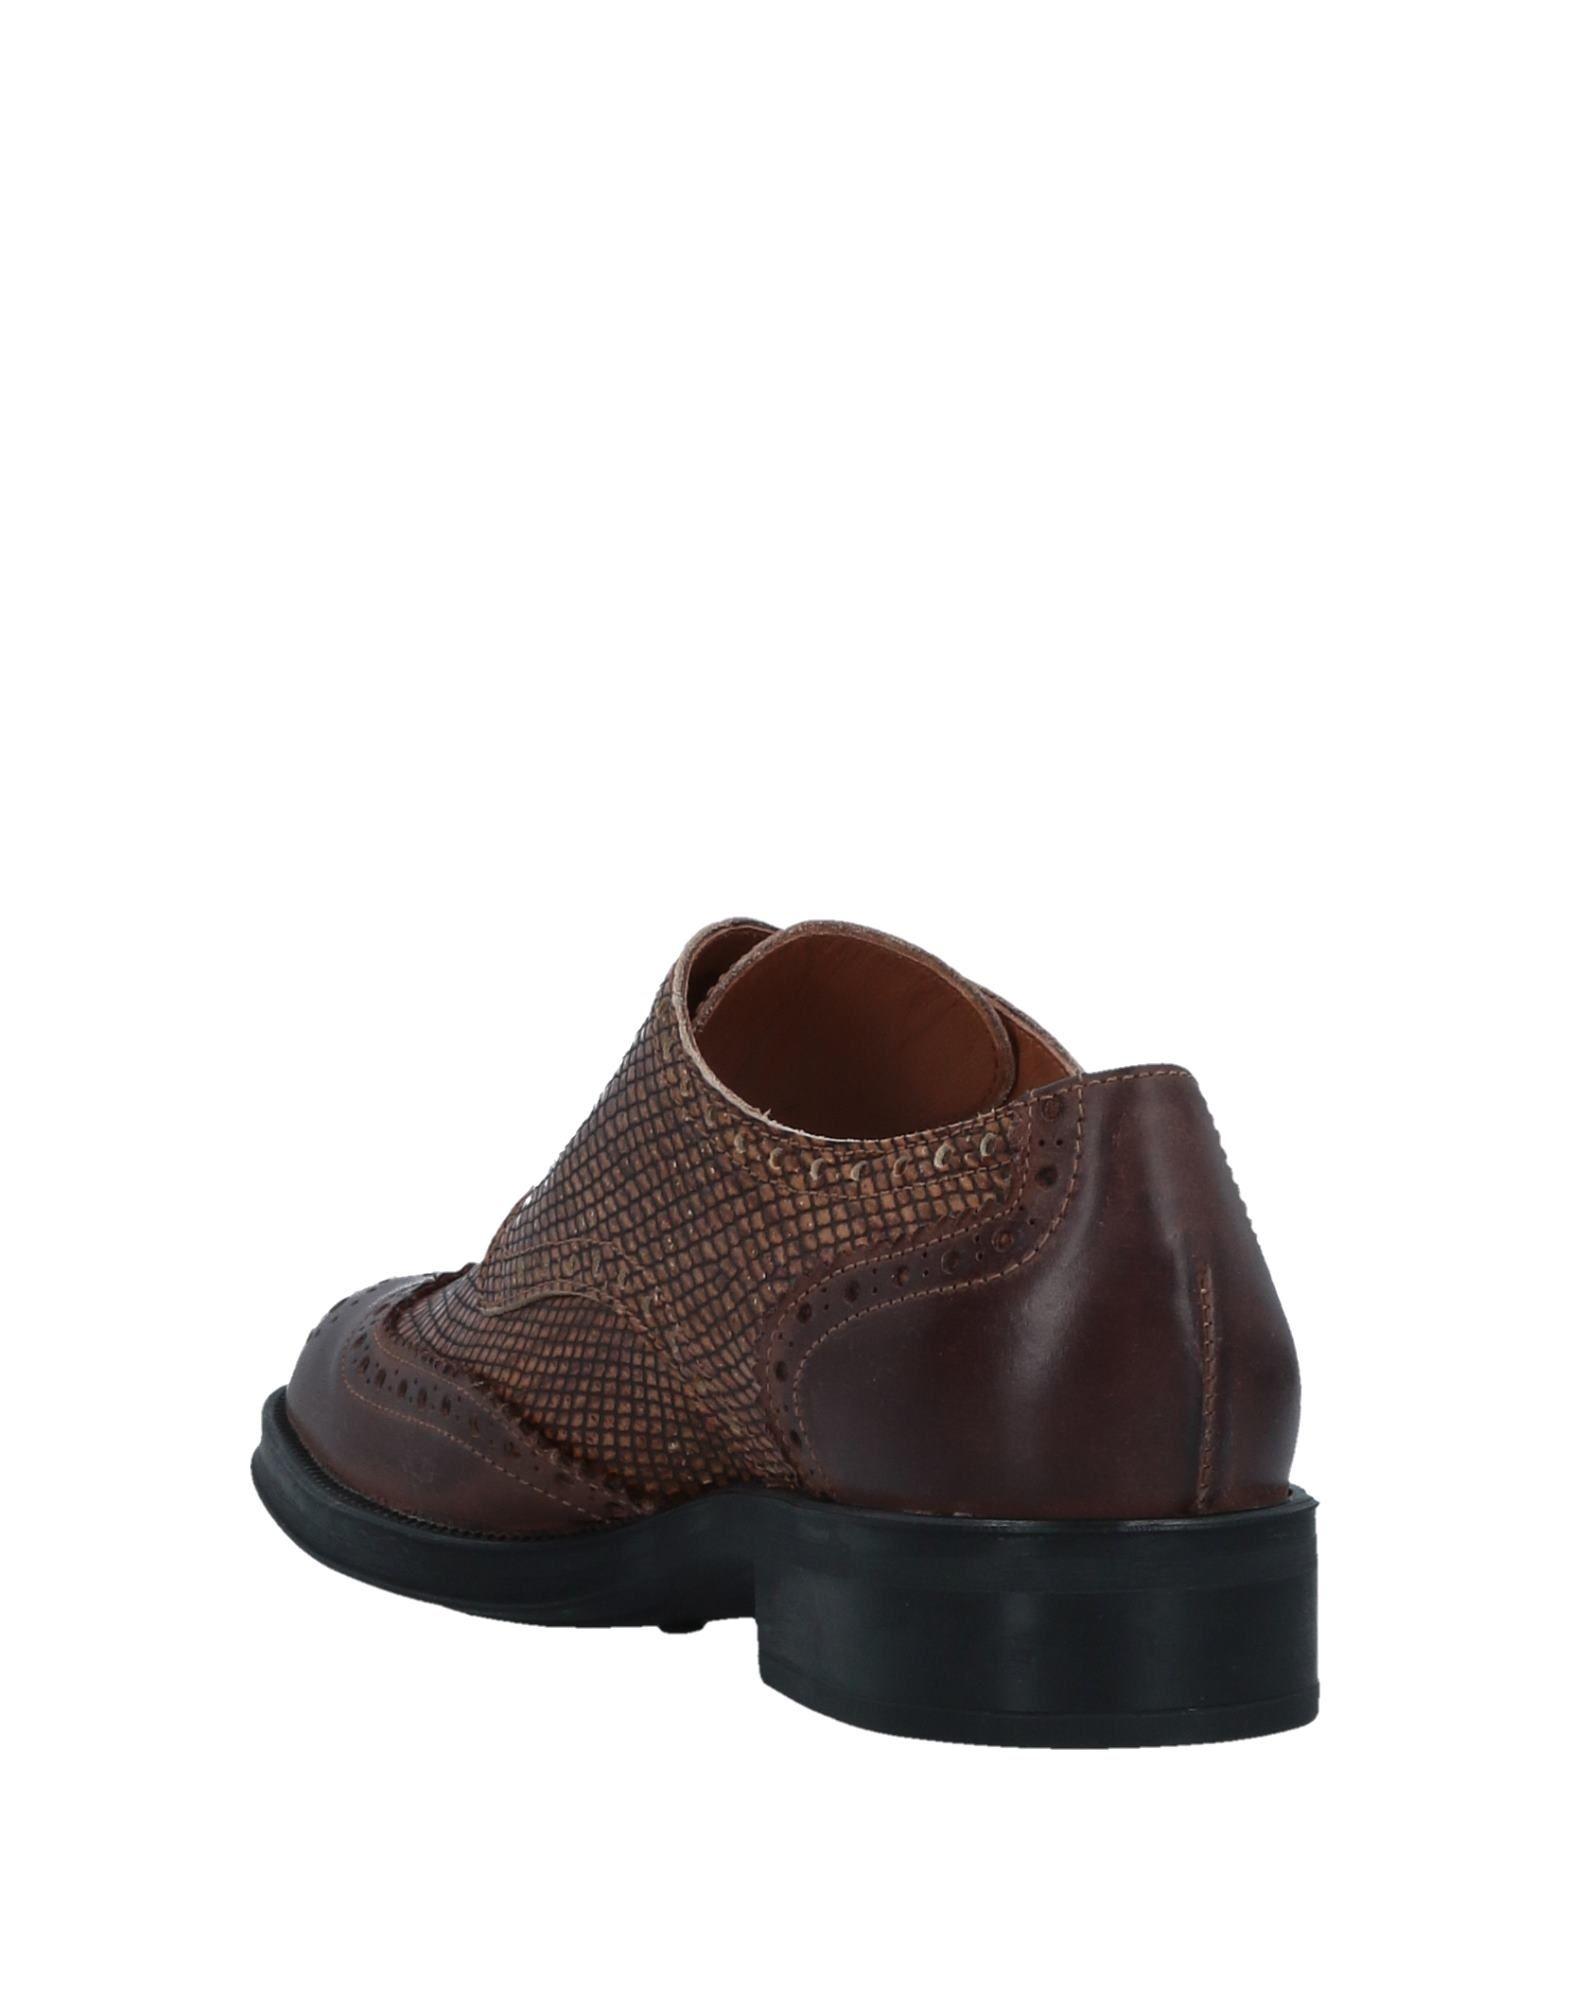 F.Lli Bruglia Mokassins Damen  11520256WHGut aussehende strapazierfähige Schuhe